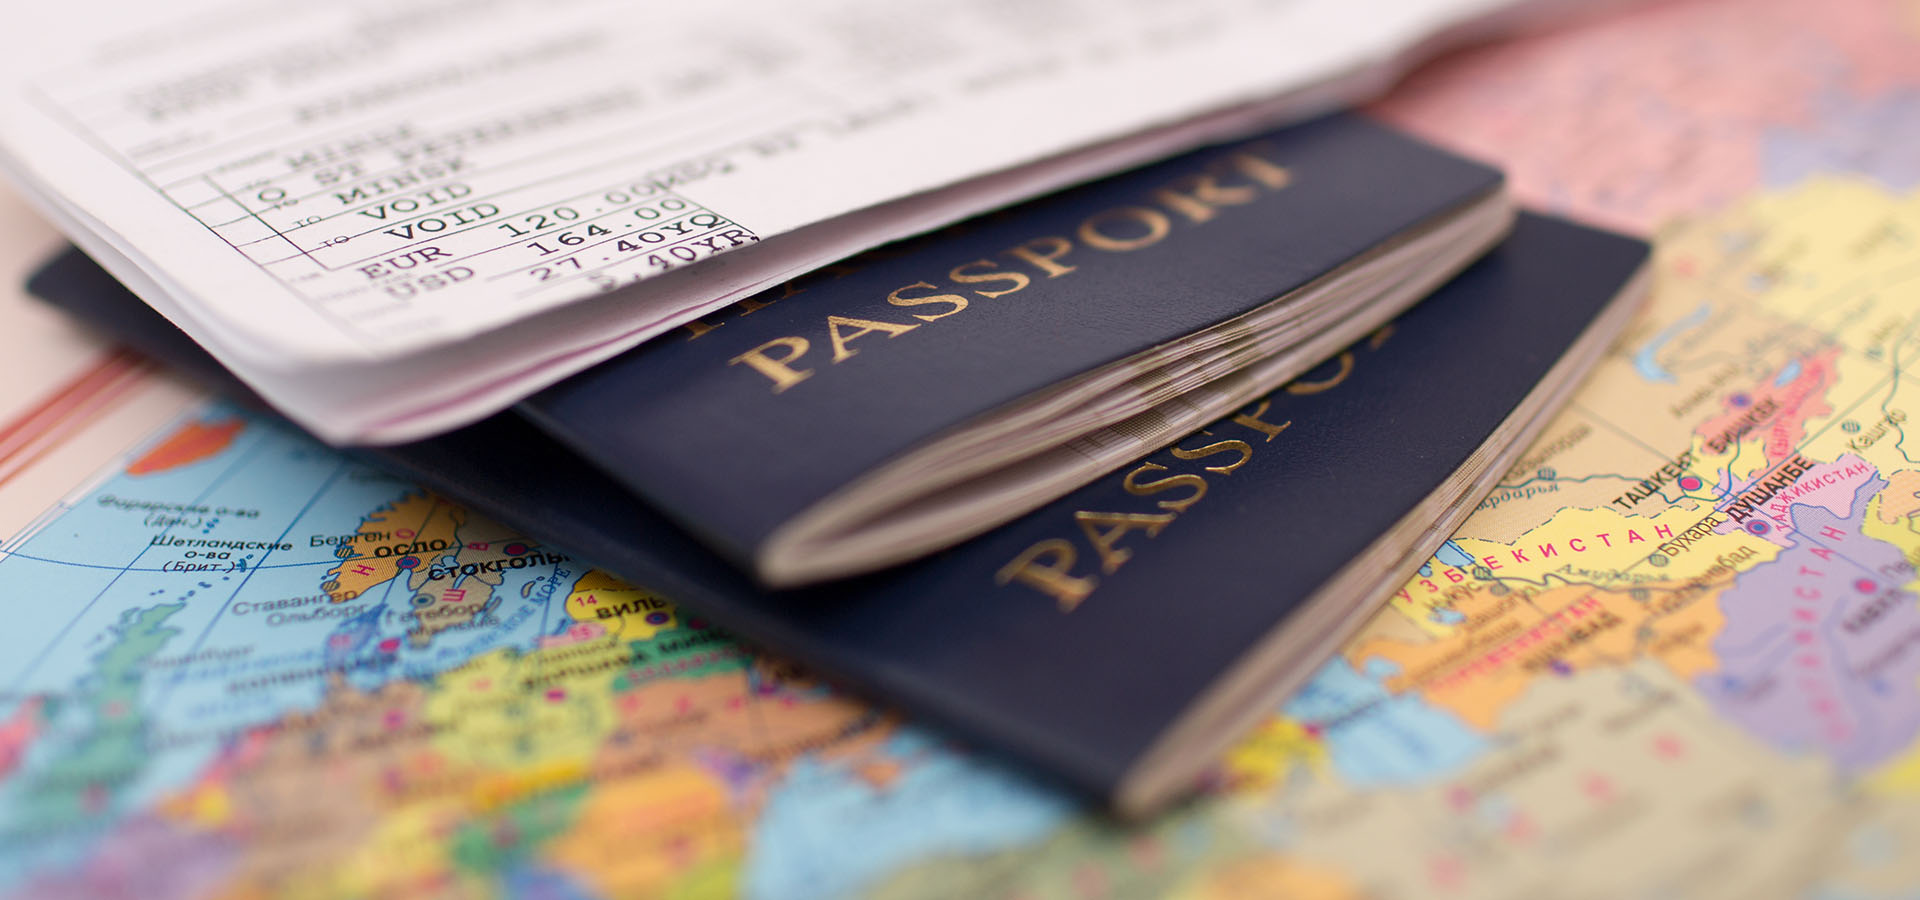 Проверьте ваш паспорт